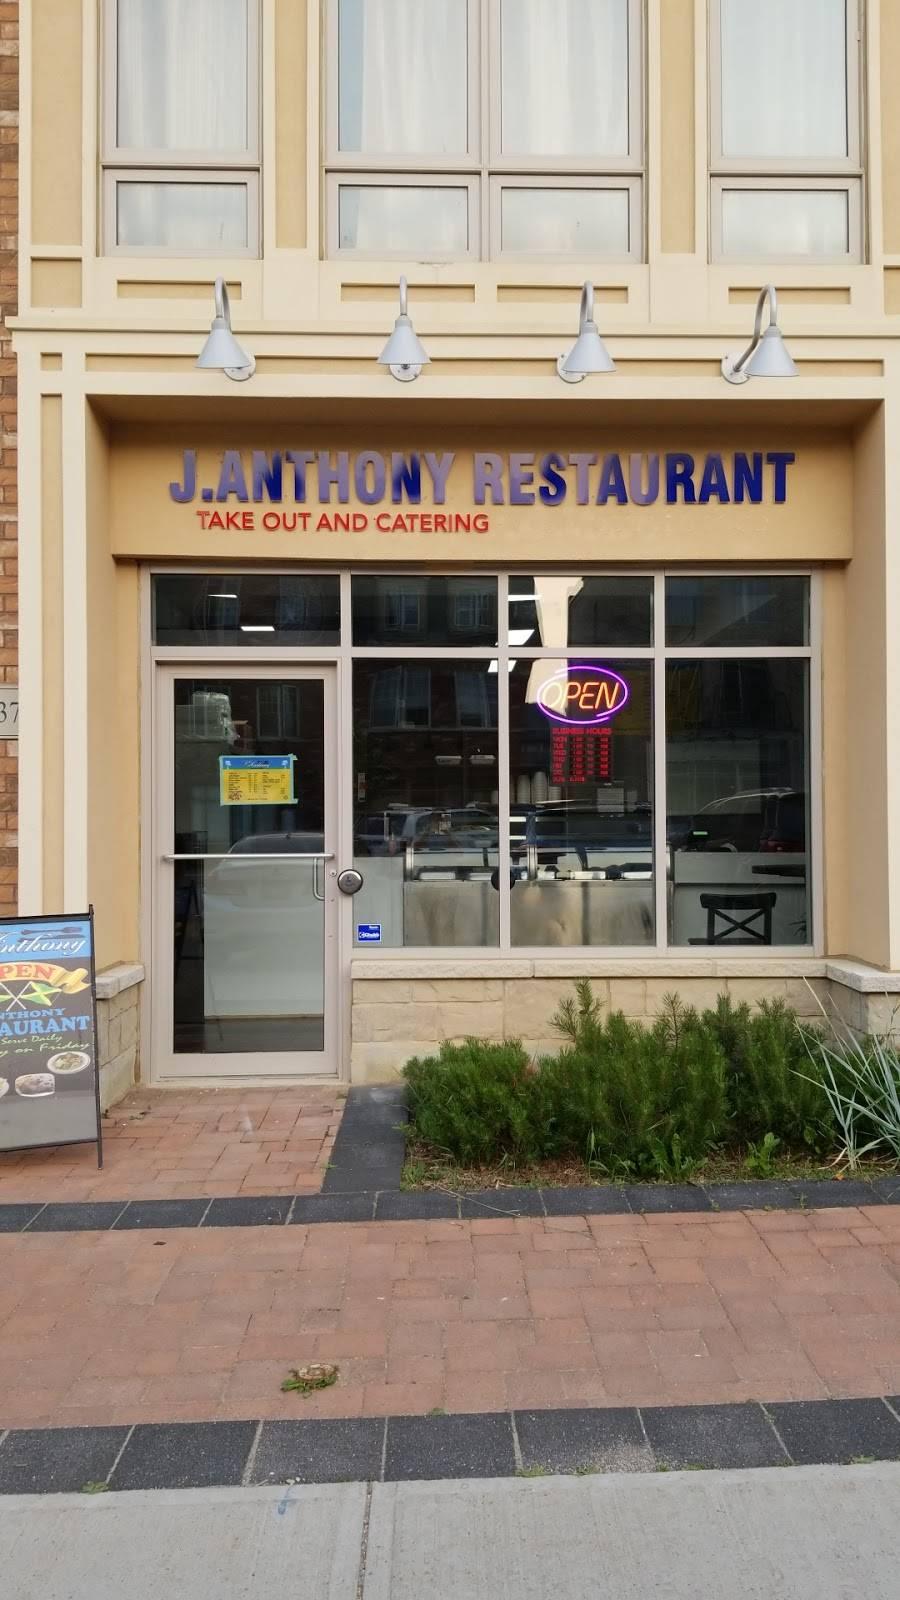 J Anthony Restaurant (Jamaican Cuisine)   restaurant   137 Inspire Blvd, Brampton, ON L6R 0B3, Canada   9057915102 OR +1 905-791-5102